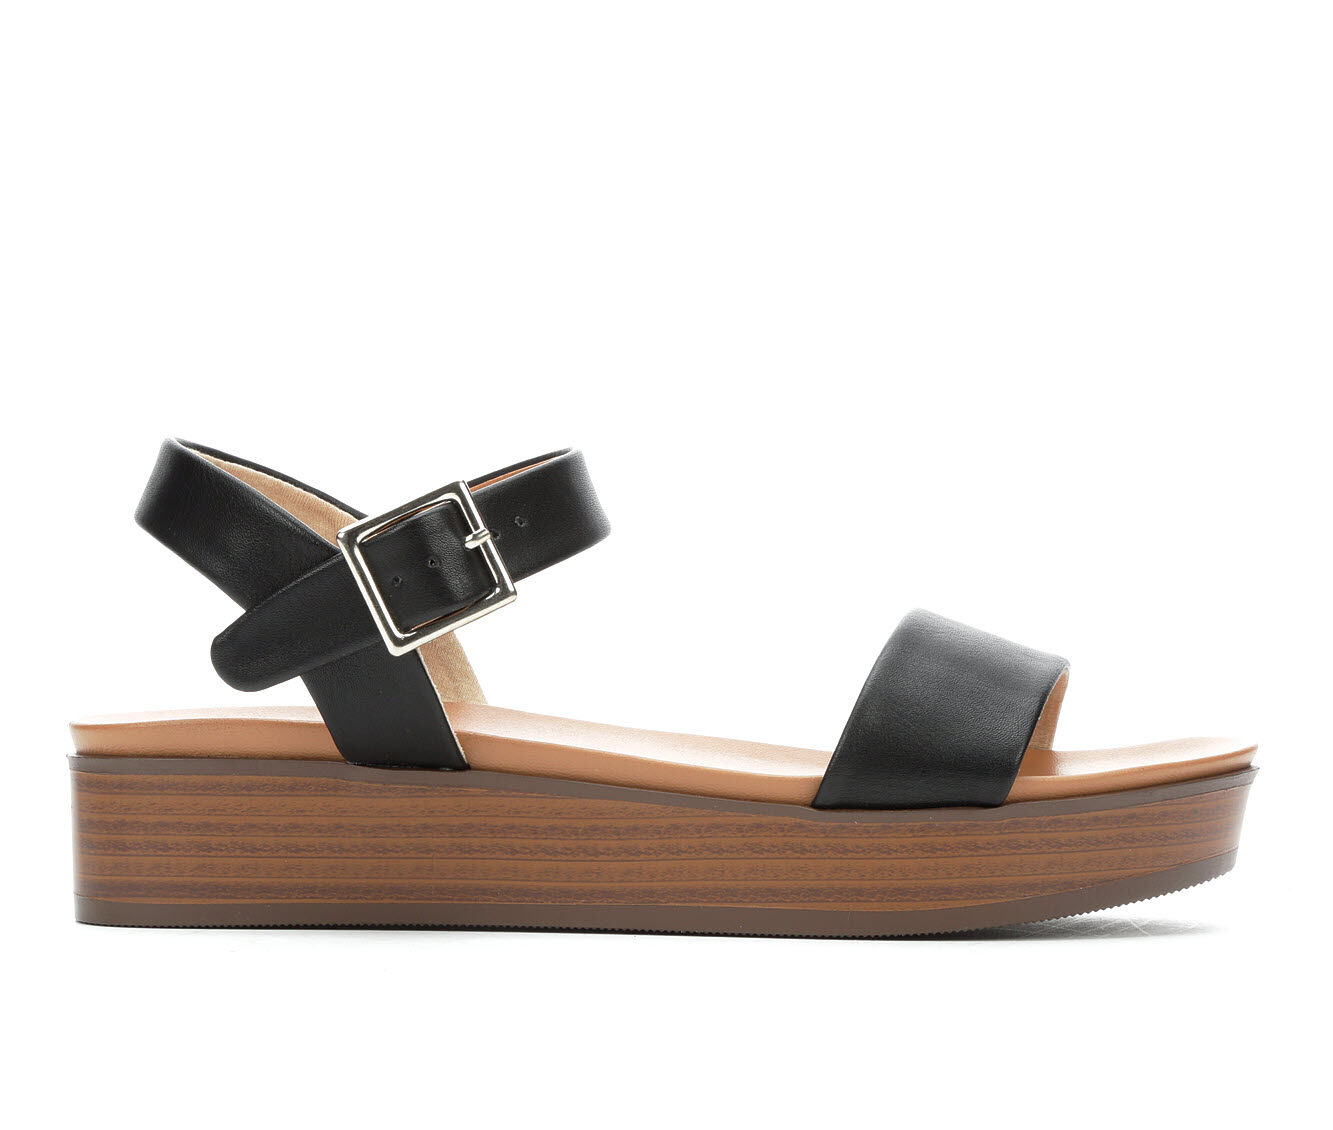 buy new Women's Soda Nebula-S Flatform Sandals Black